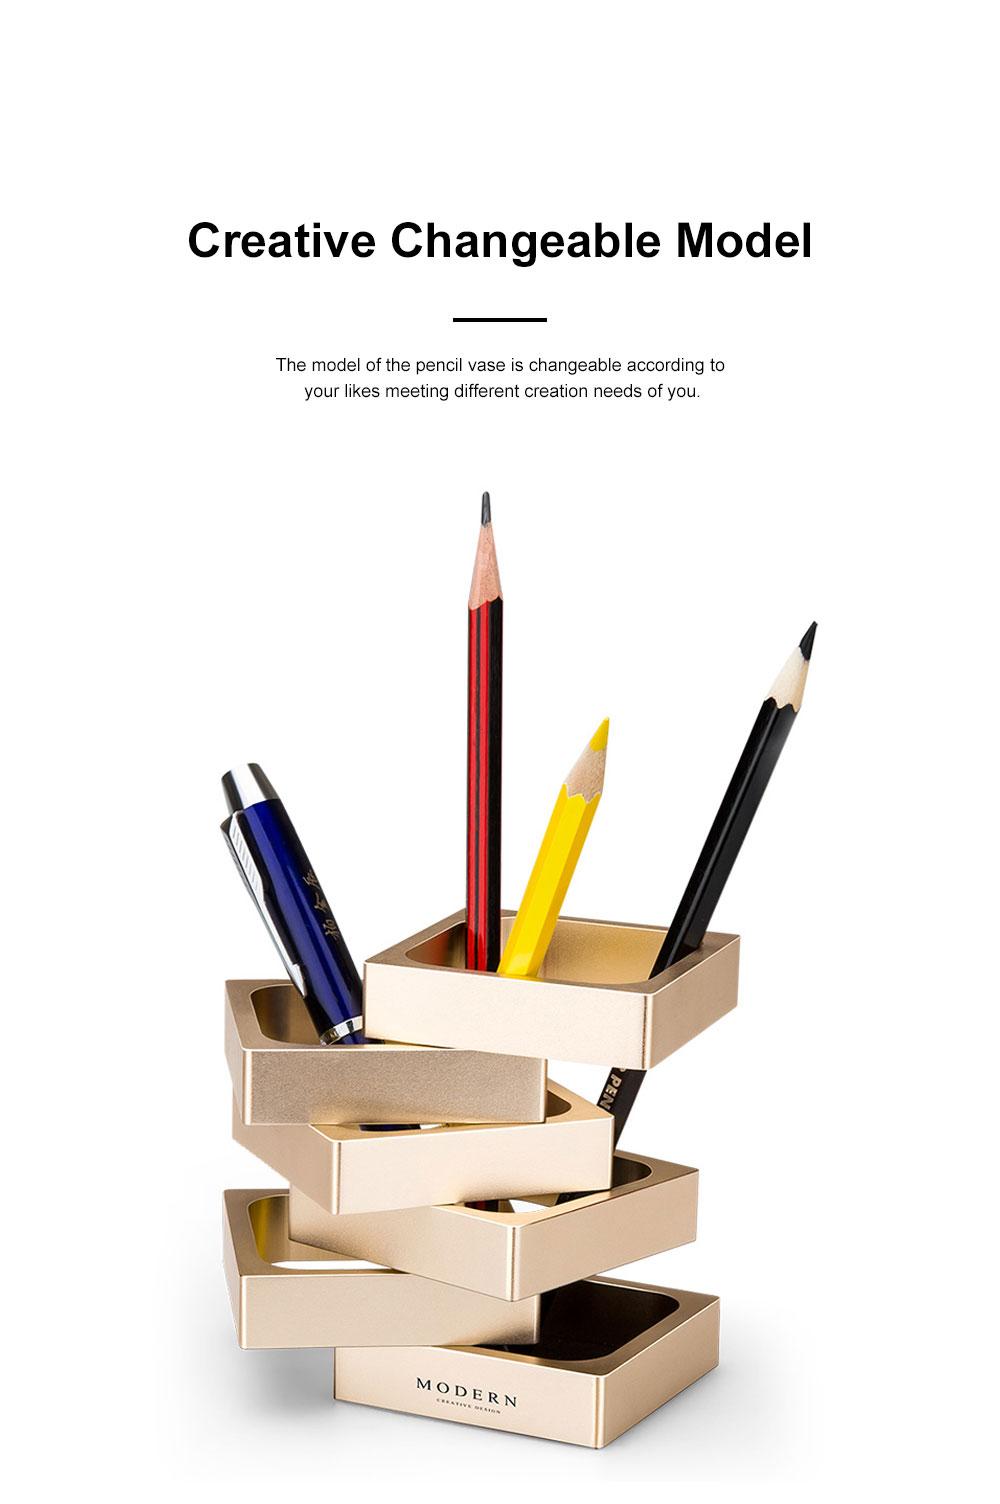 Creative Changeable Model Pencil Vase Brush Pot Office Desktop Ornament Aluminum Alloy Storage Box 3